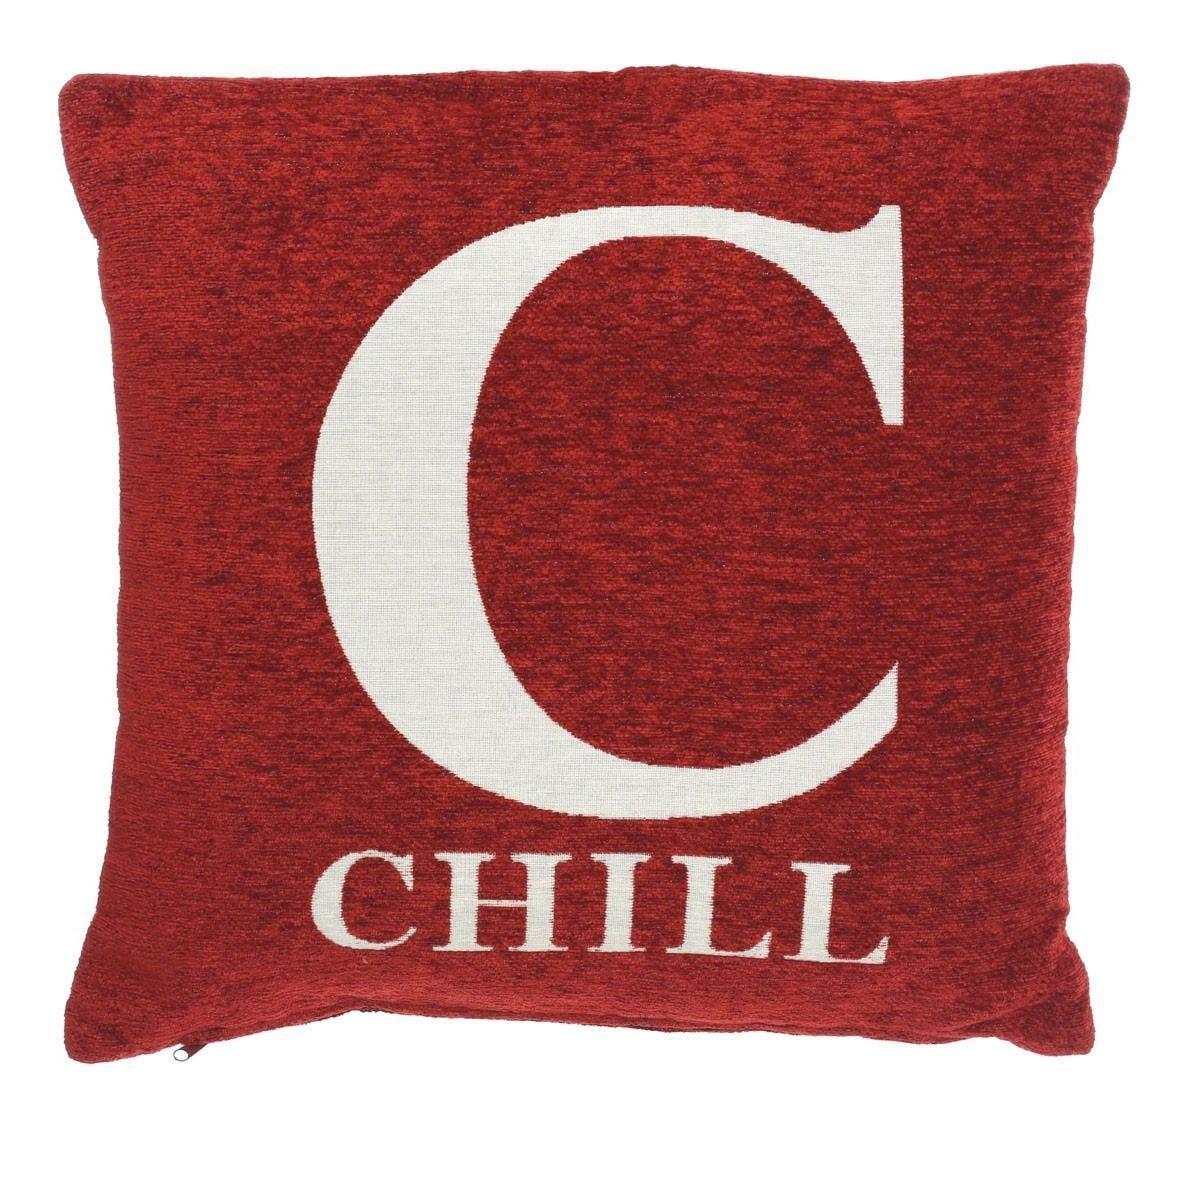 Premier Housewares 'Chill' Cushion - Red